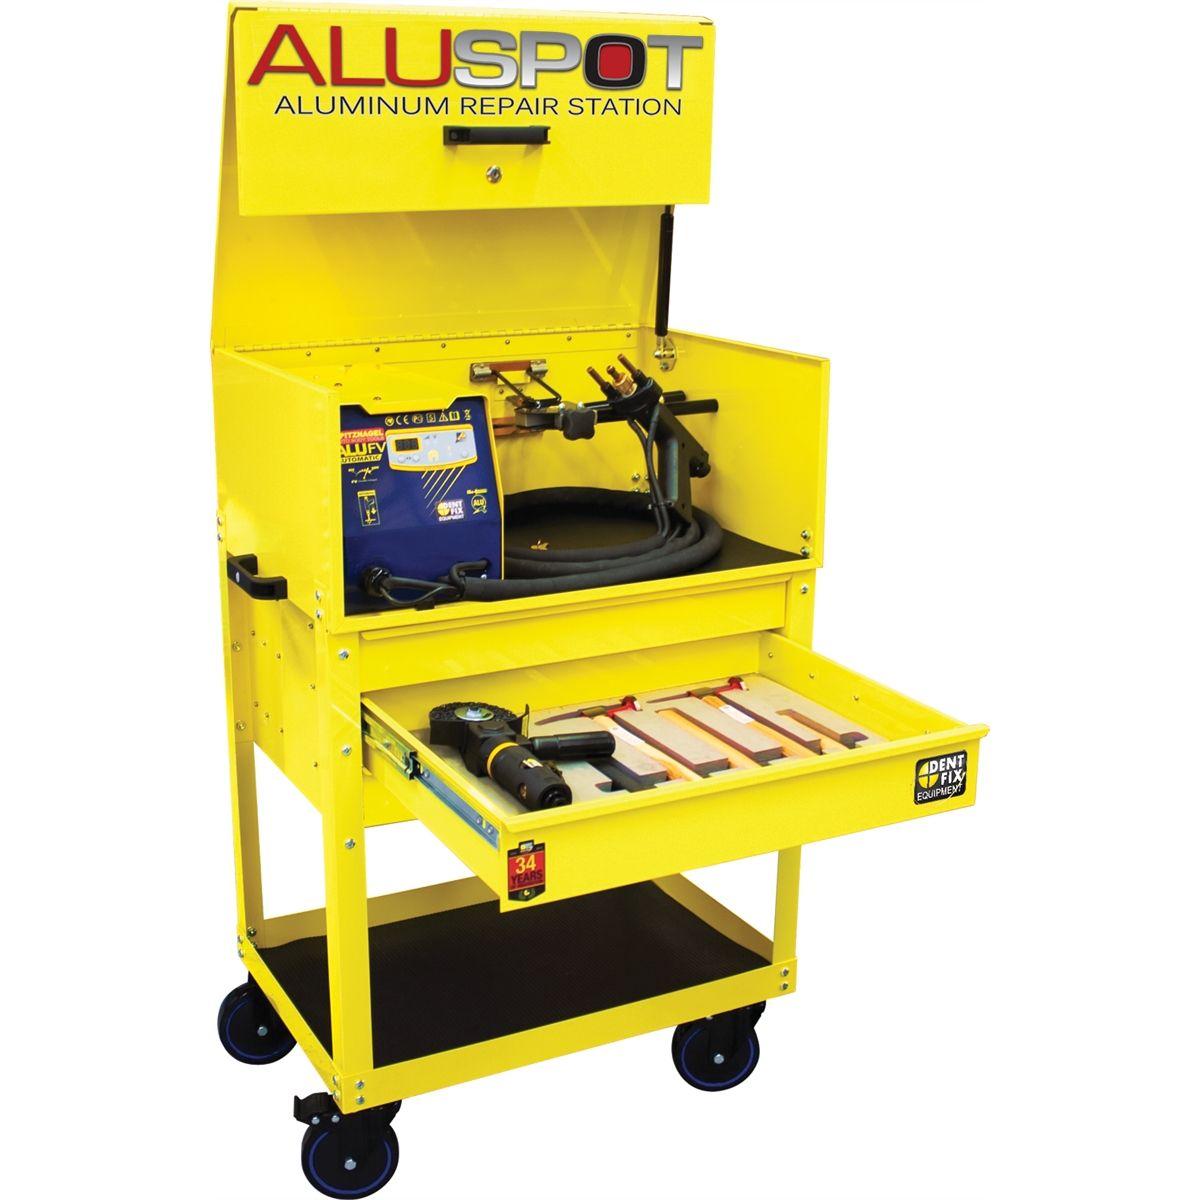 Aluspot Deluxe Aluminum Repair Station Dent Fix